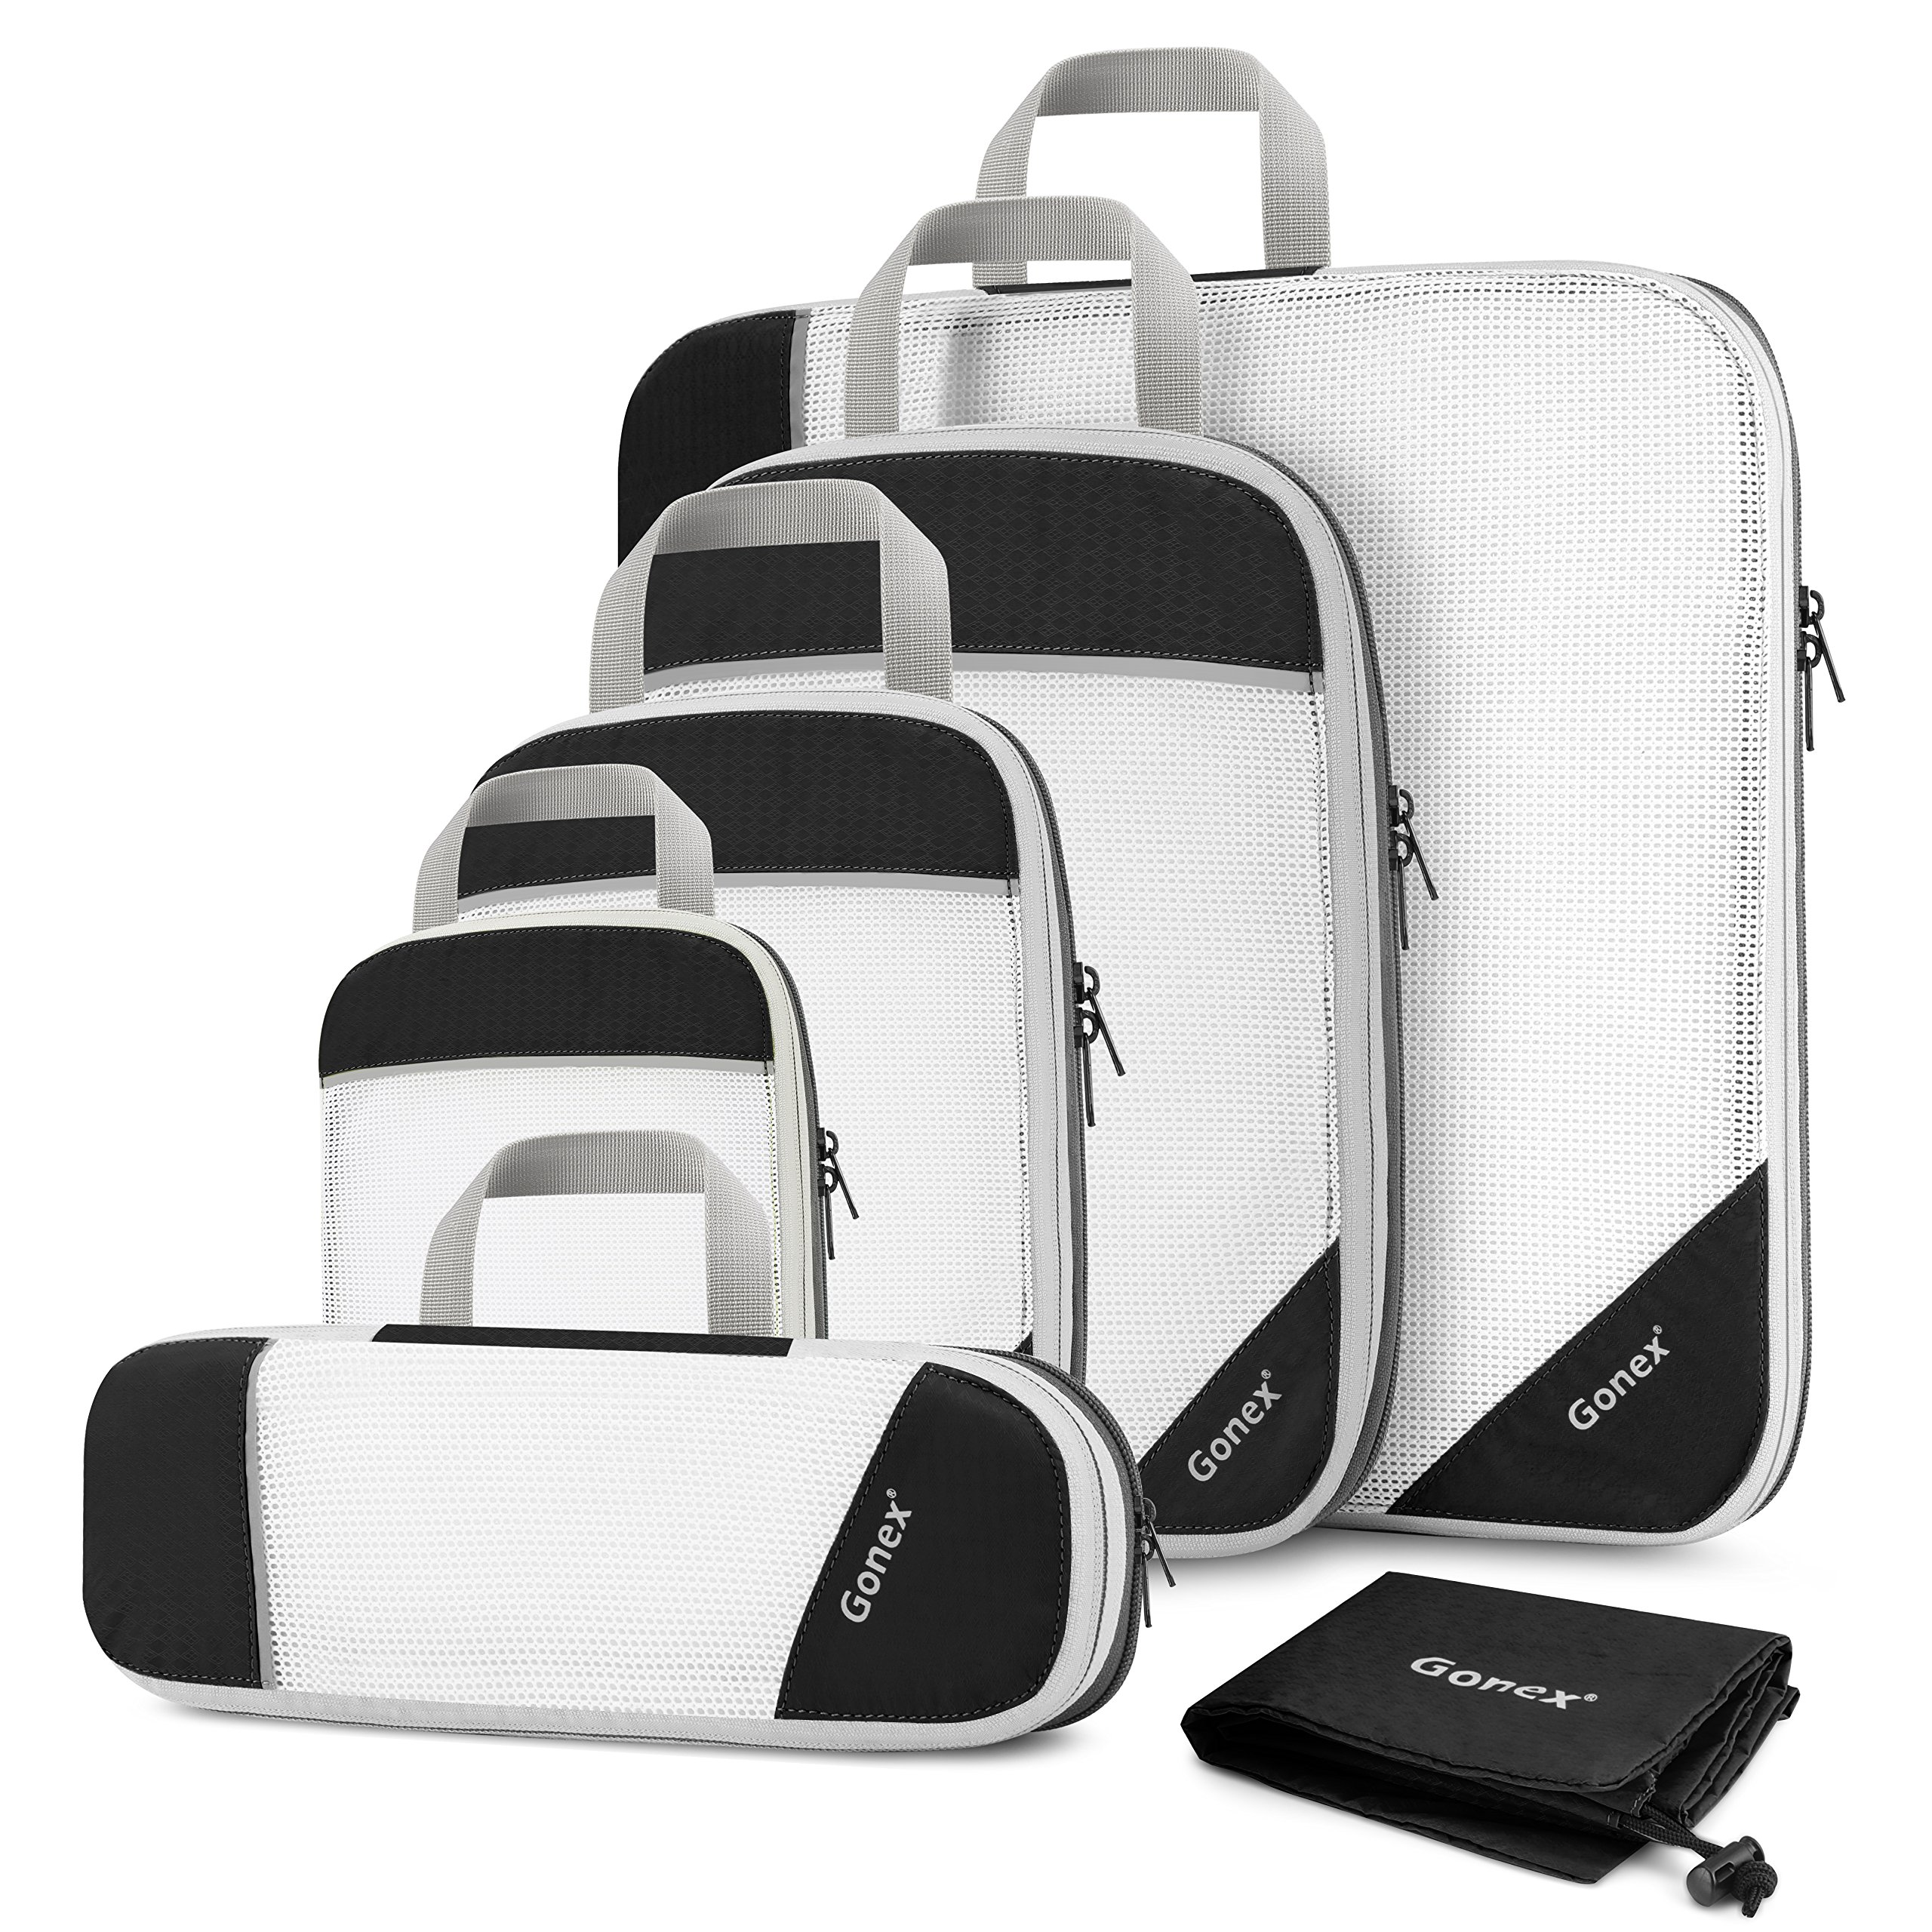 Gonex Compression Packing Cubes Mesh Organizers L+M+S+XS+Slim+Laundry Bag Black by Gonex